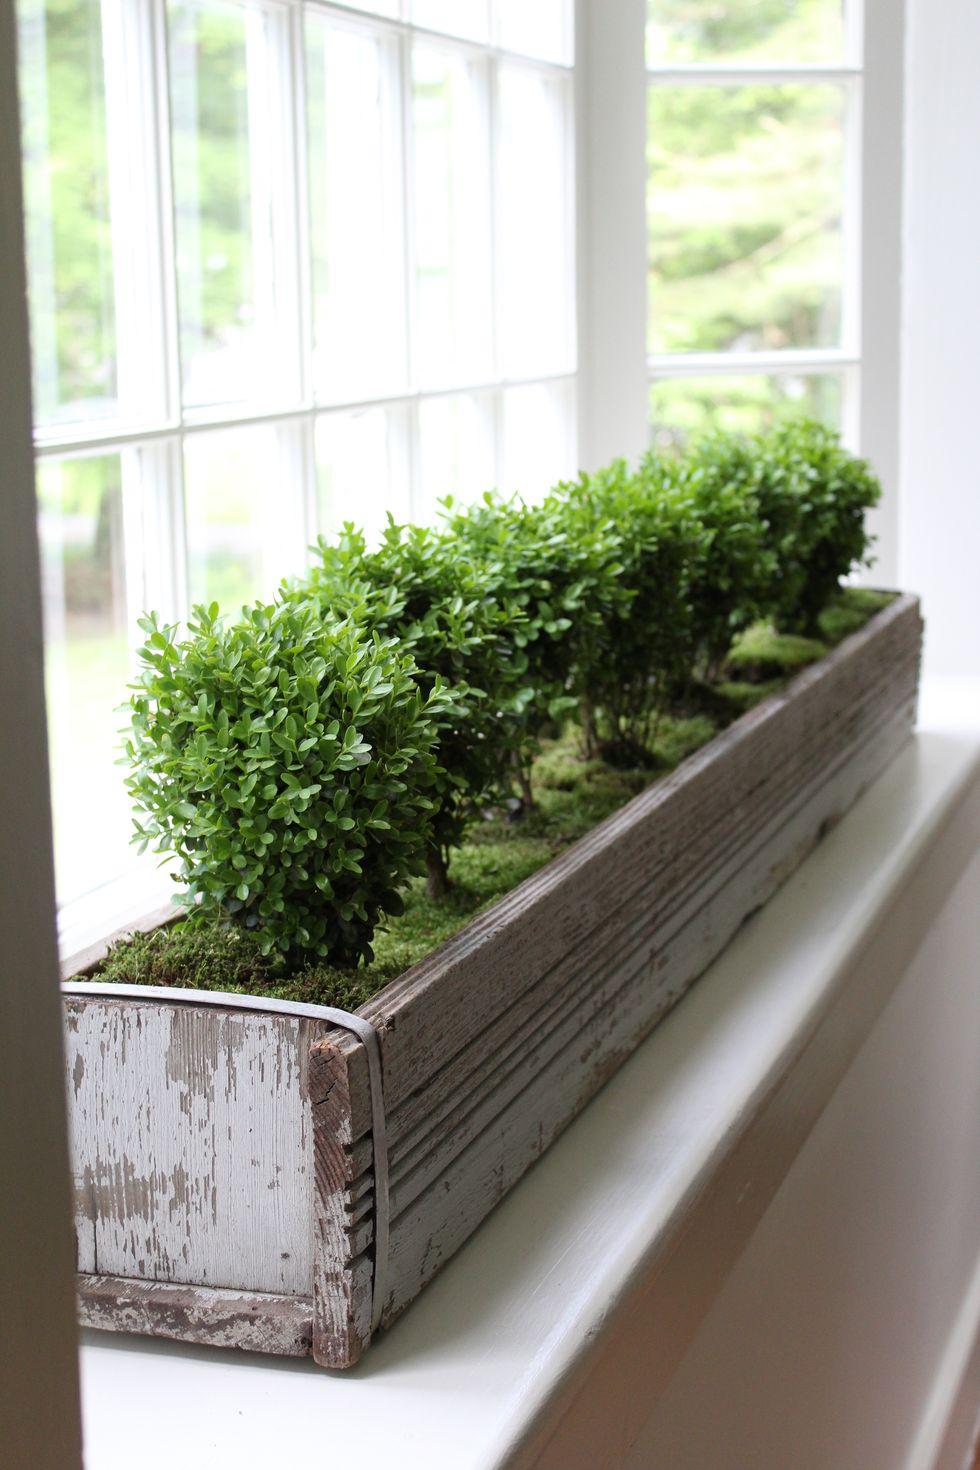 baby boxwoods in inside window box